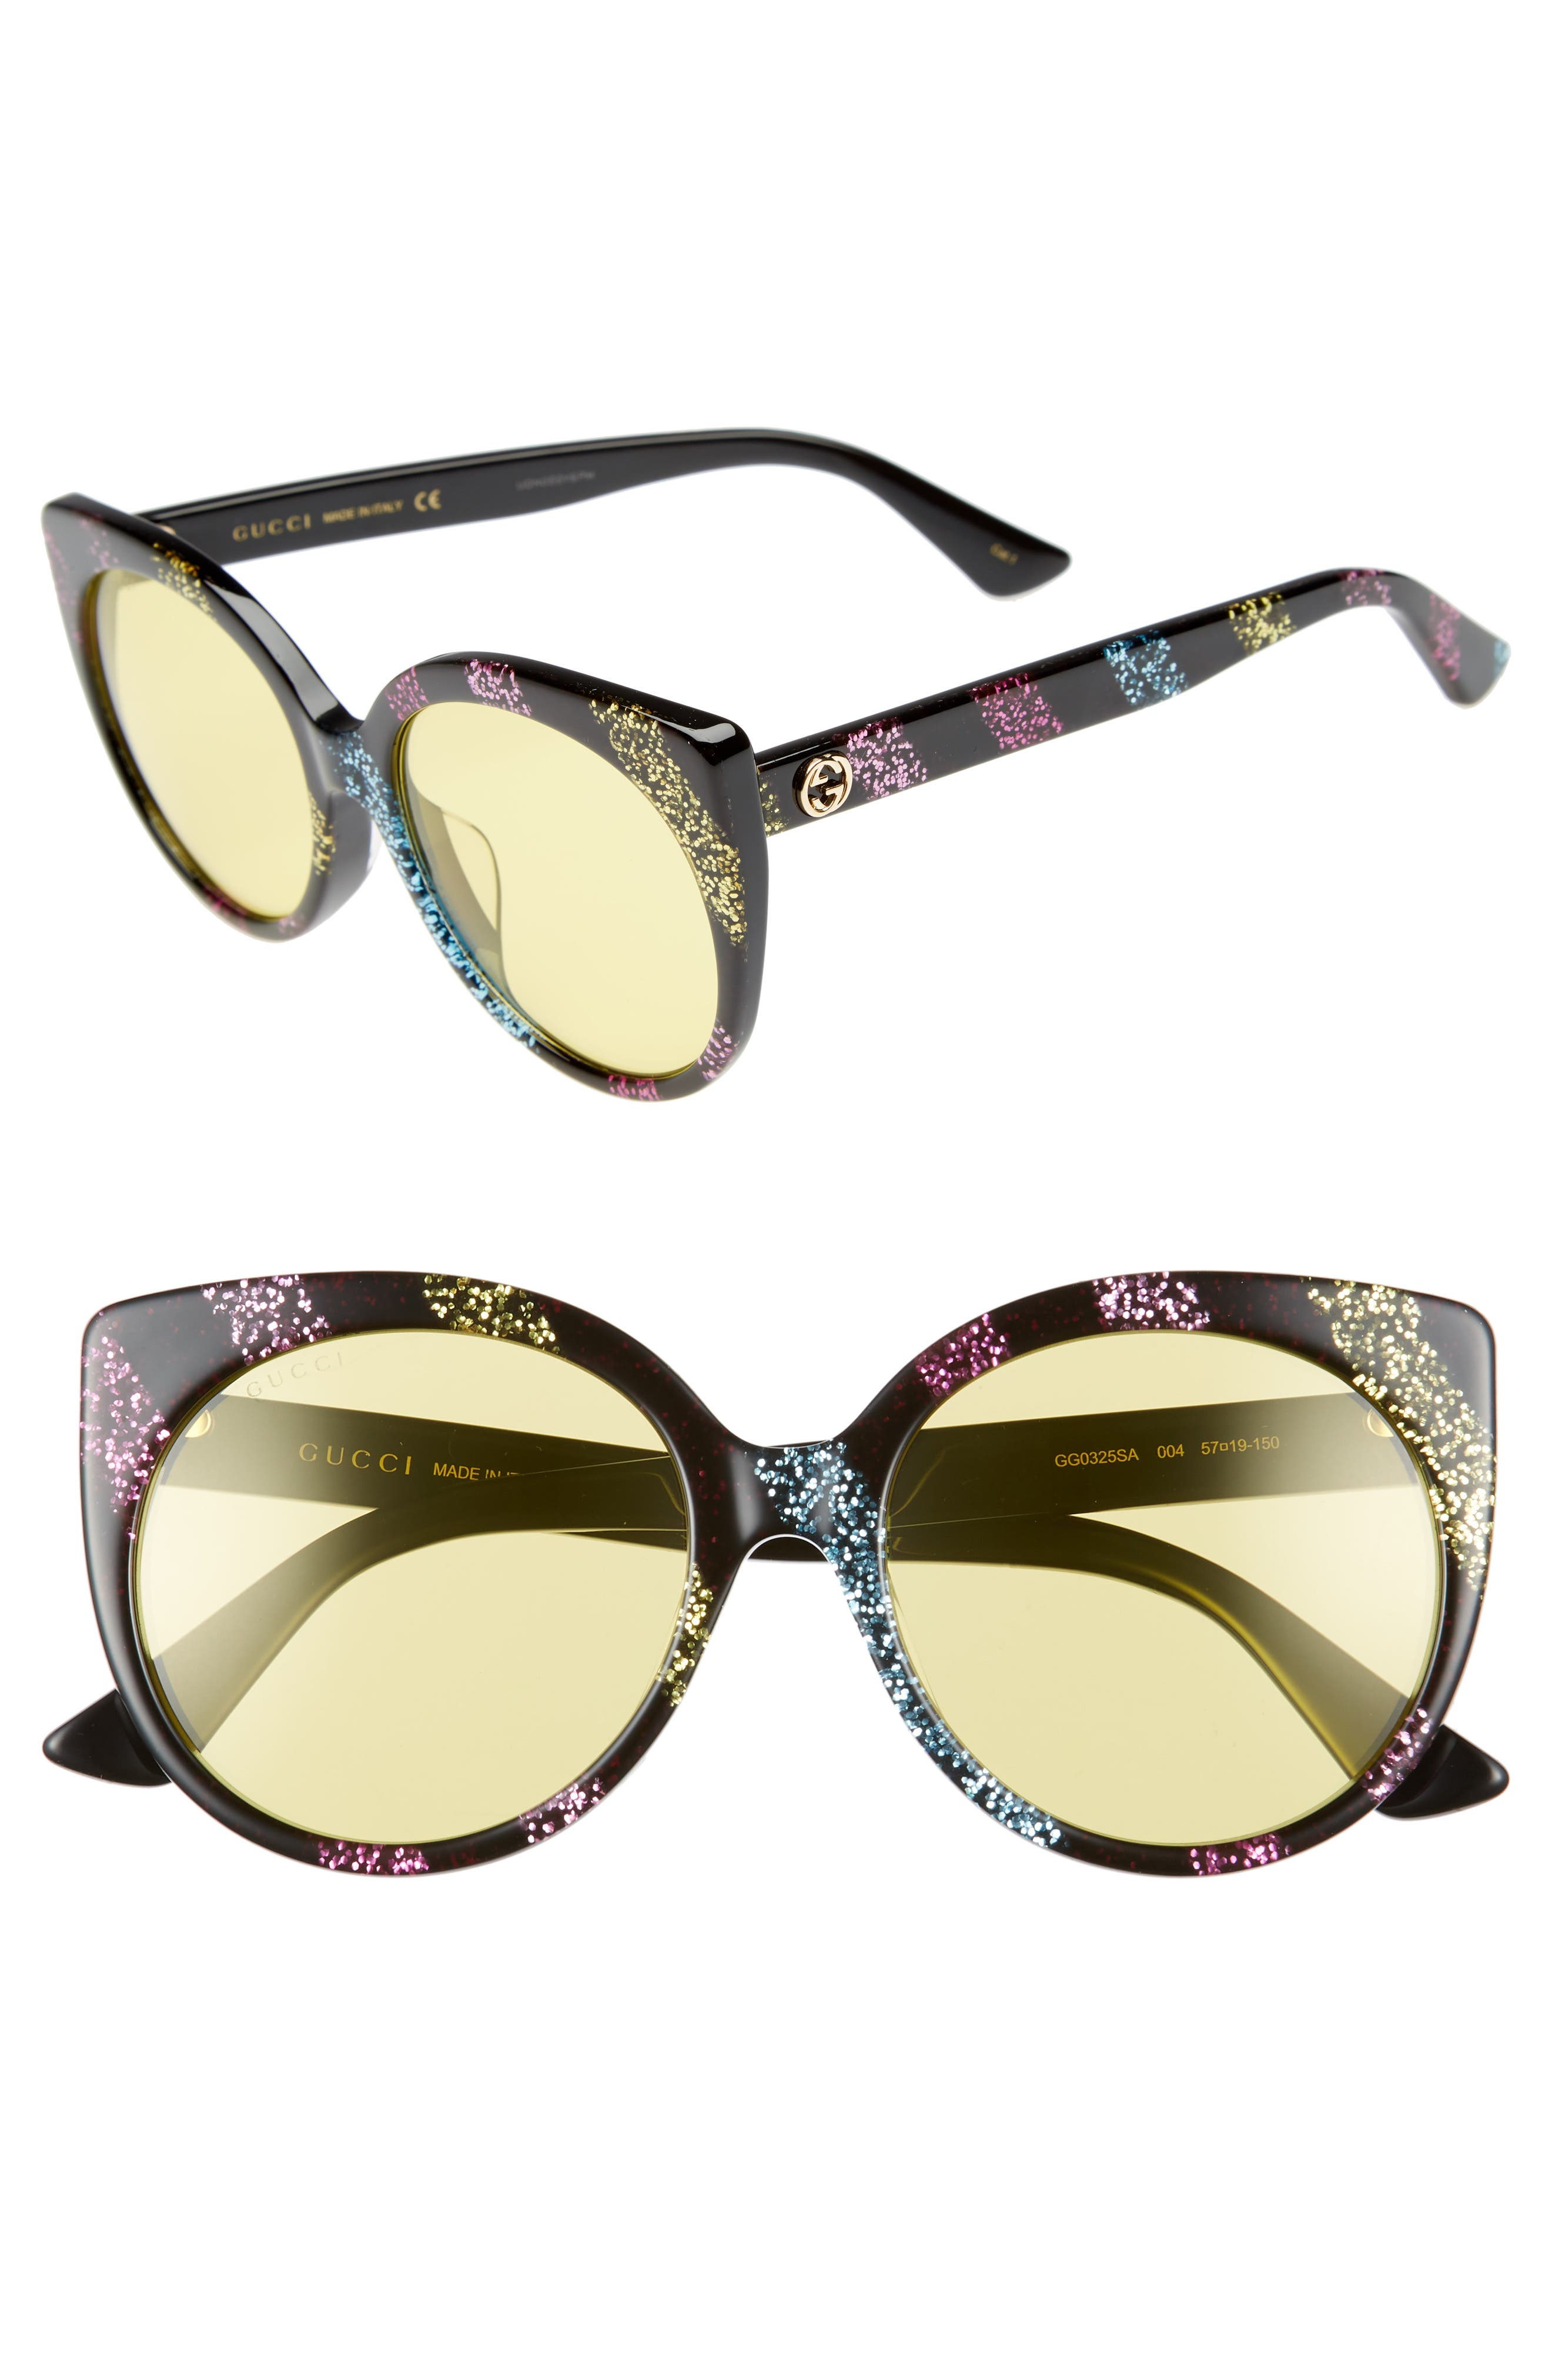 57mm Cat Eye Sunglasses,                             Main thumbnail 1, color,                             Pink/ Multicolor